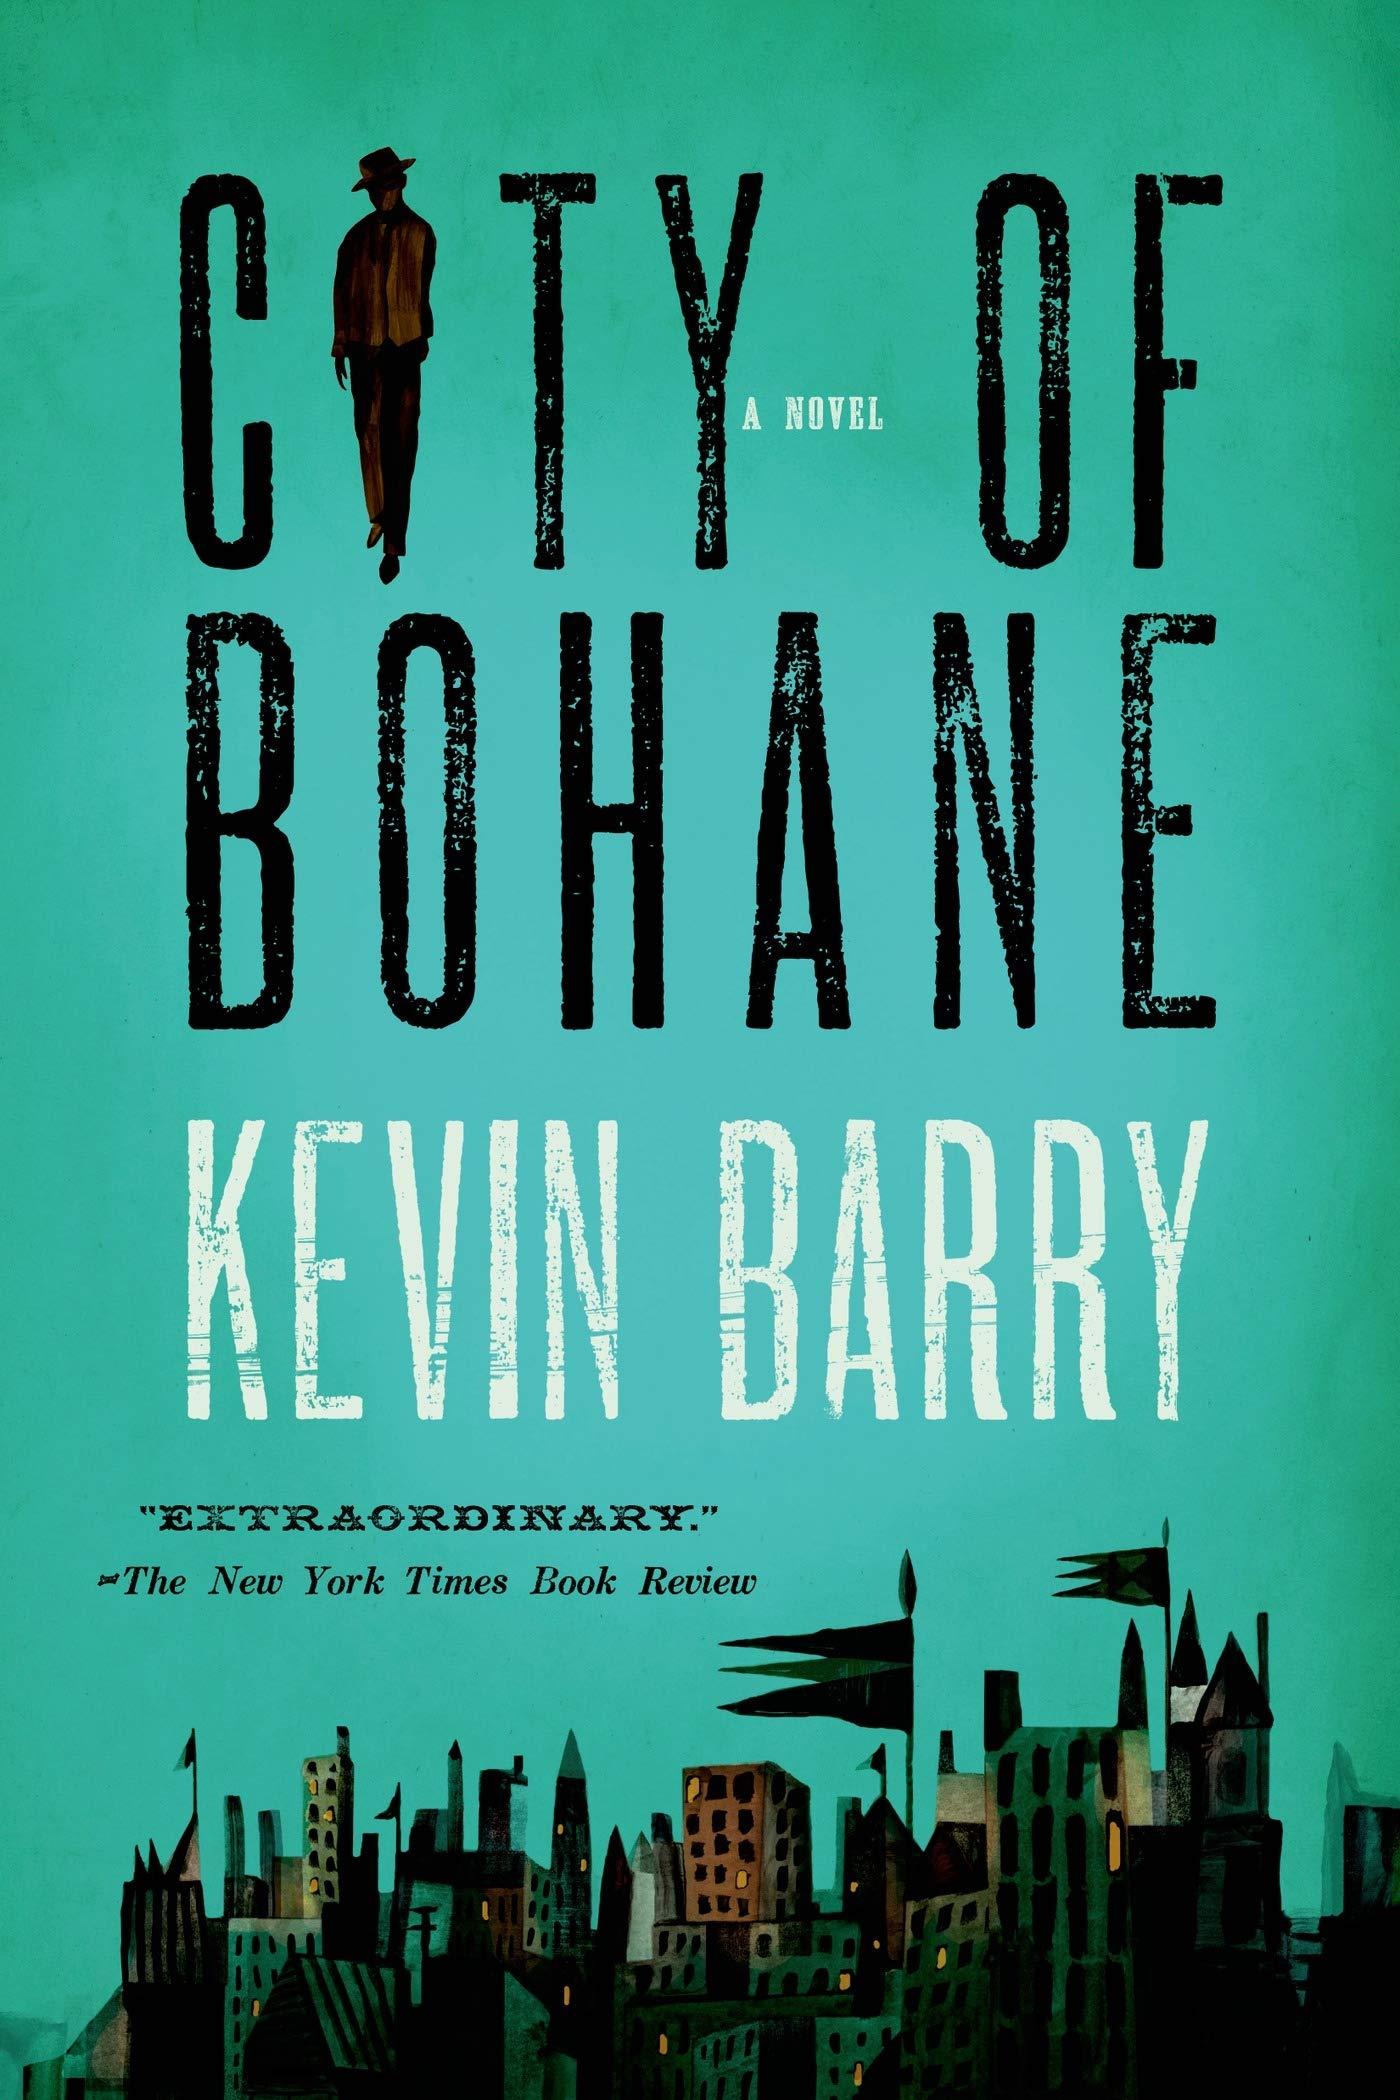 City of Bohane: A Novel: Barry, Kevin: 9781555976453: Amazon.com: Books